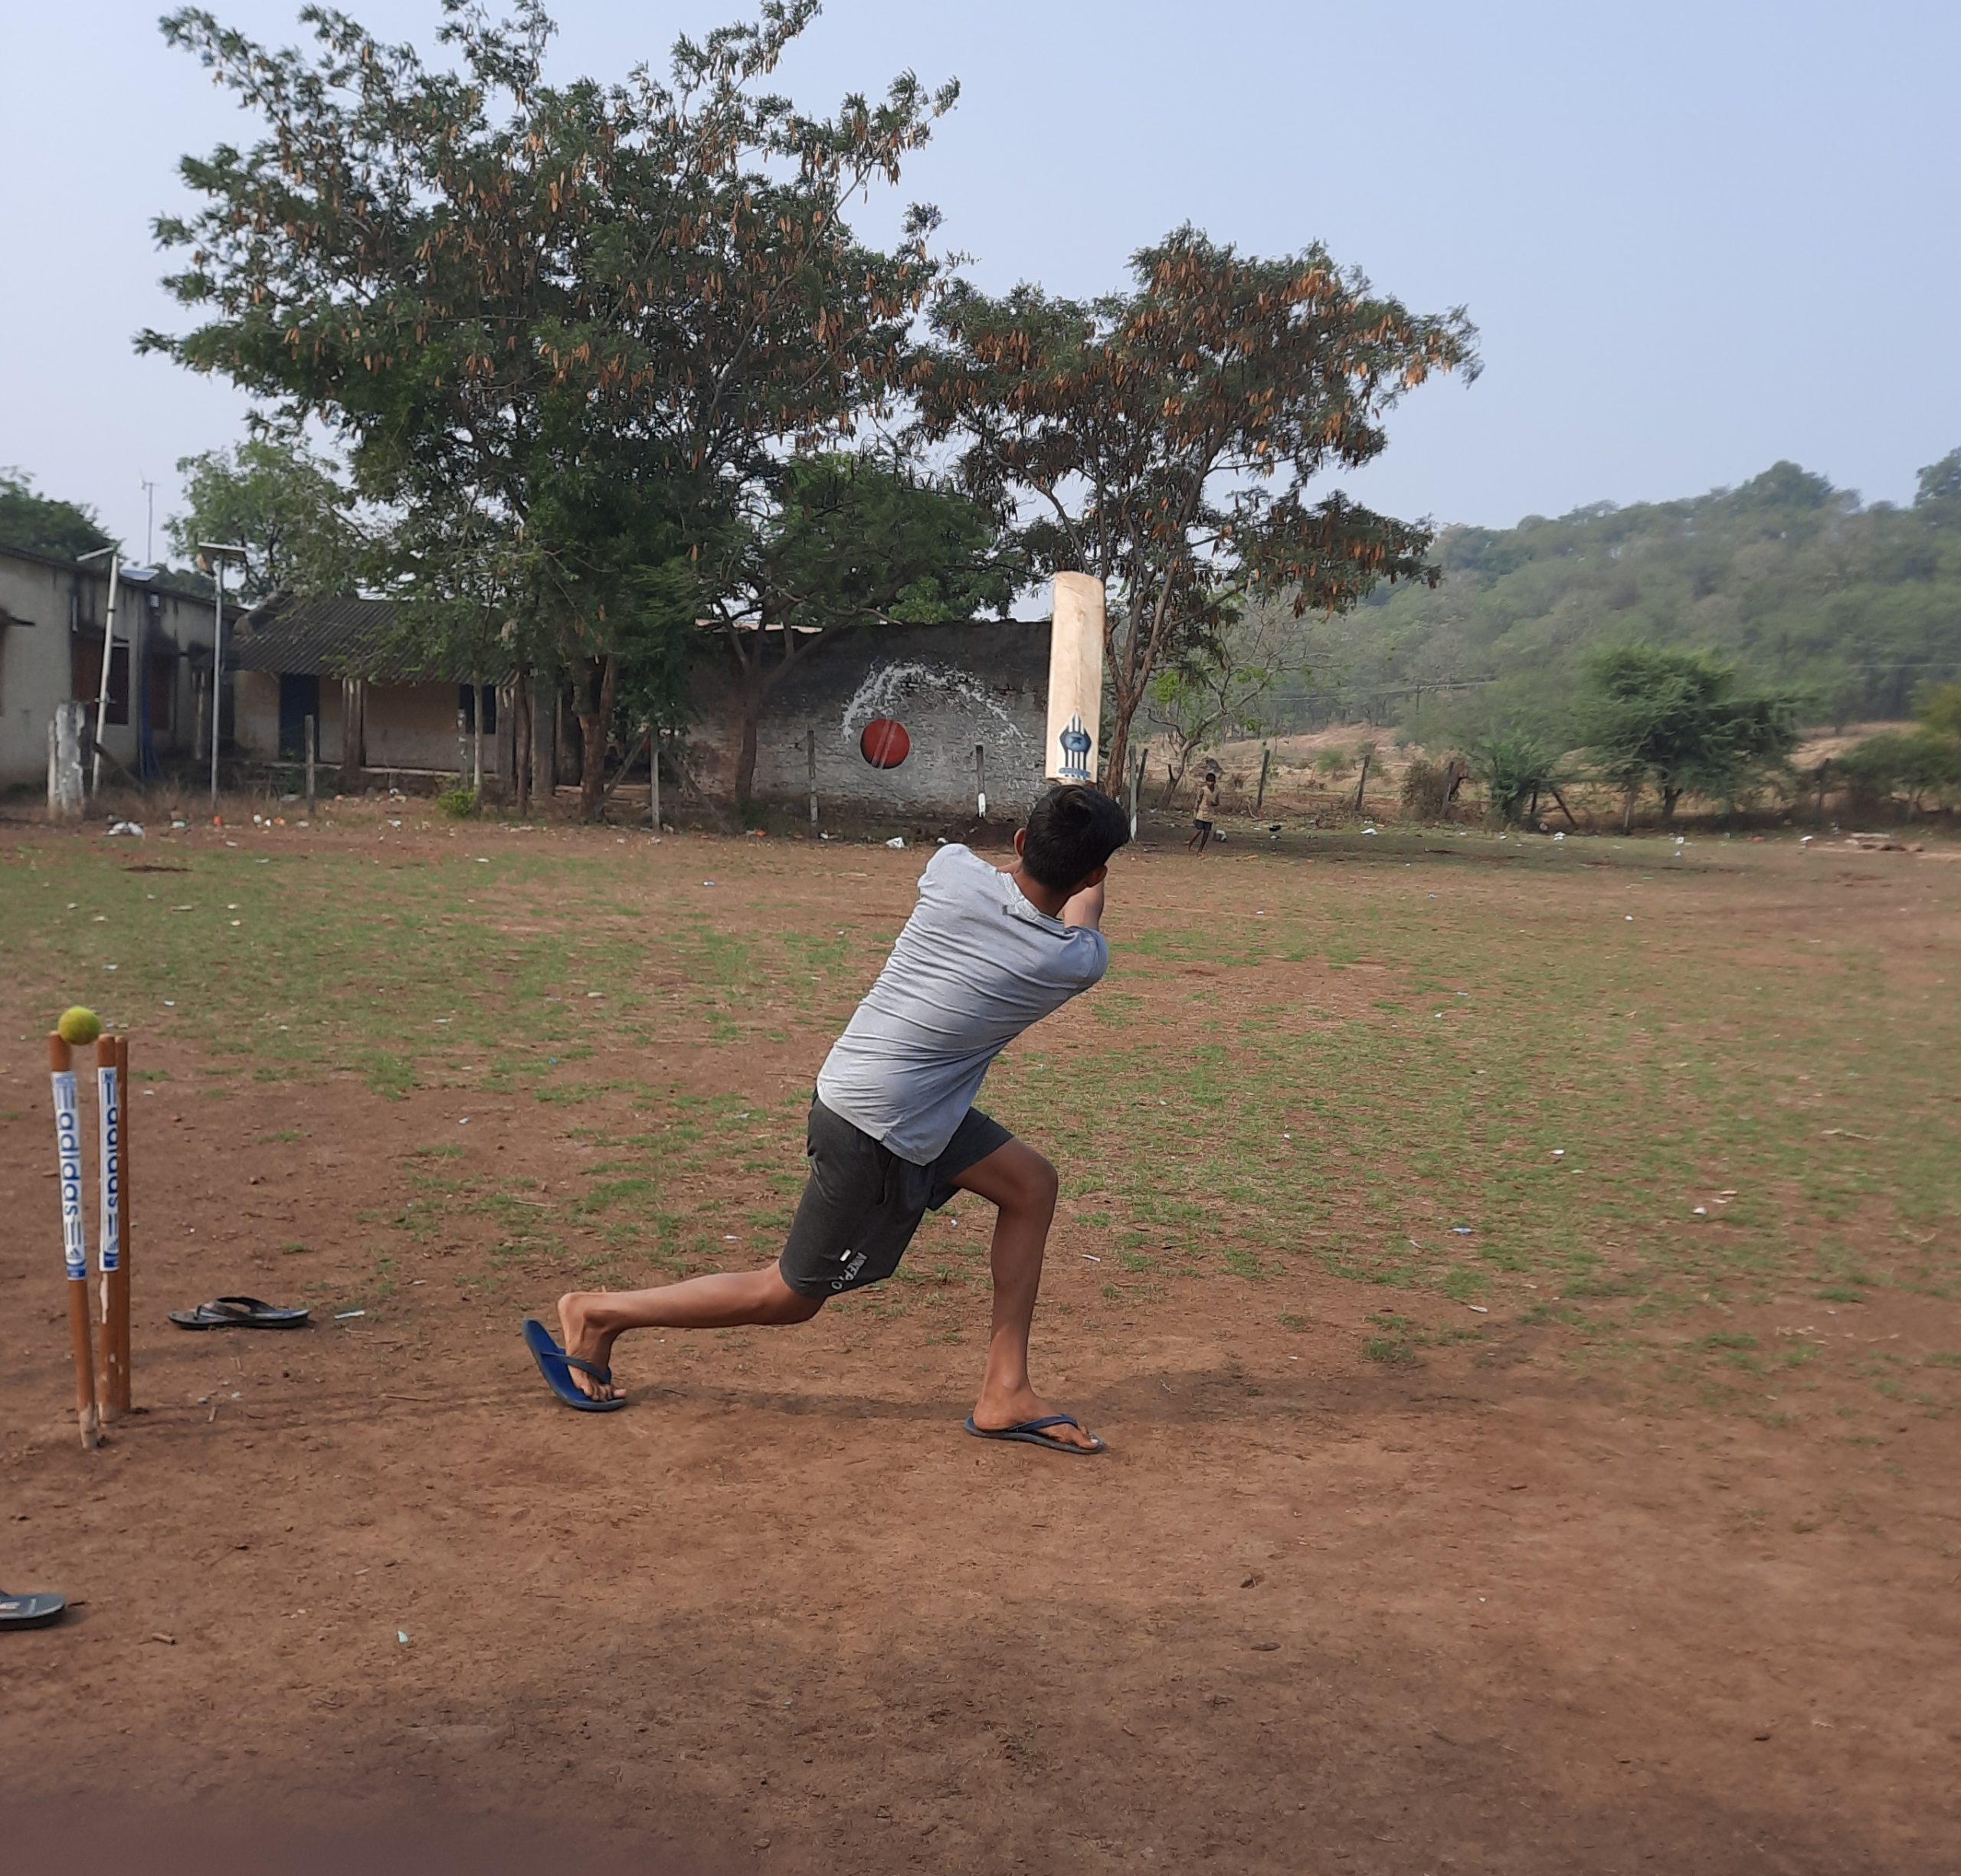 A local boy playing cricket